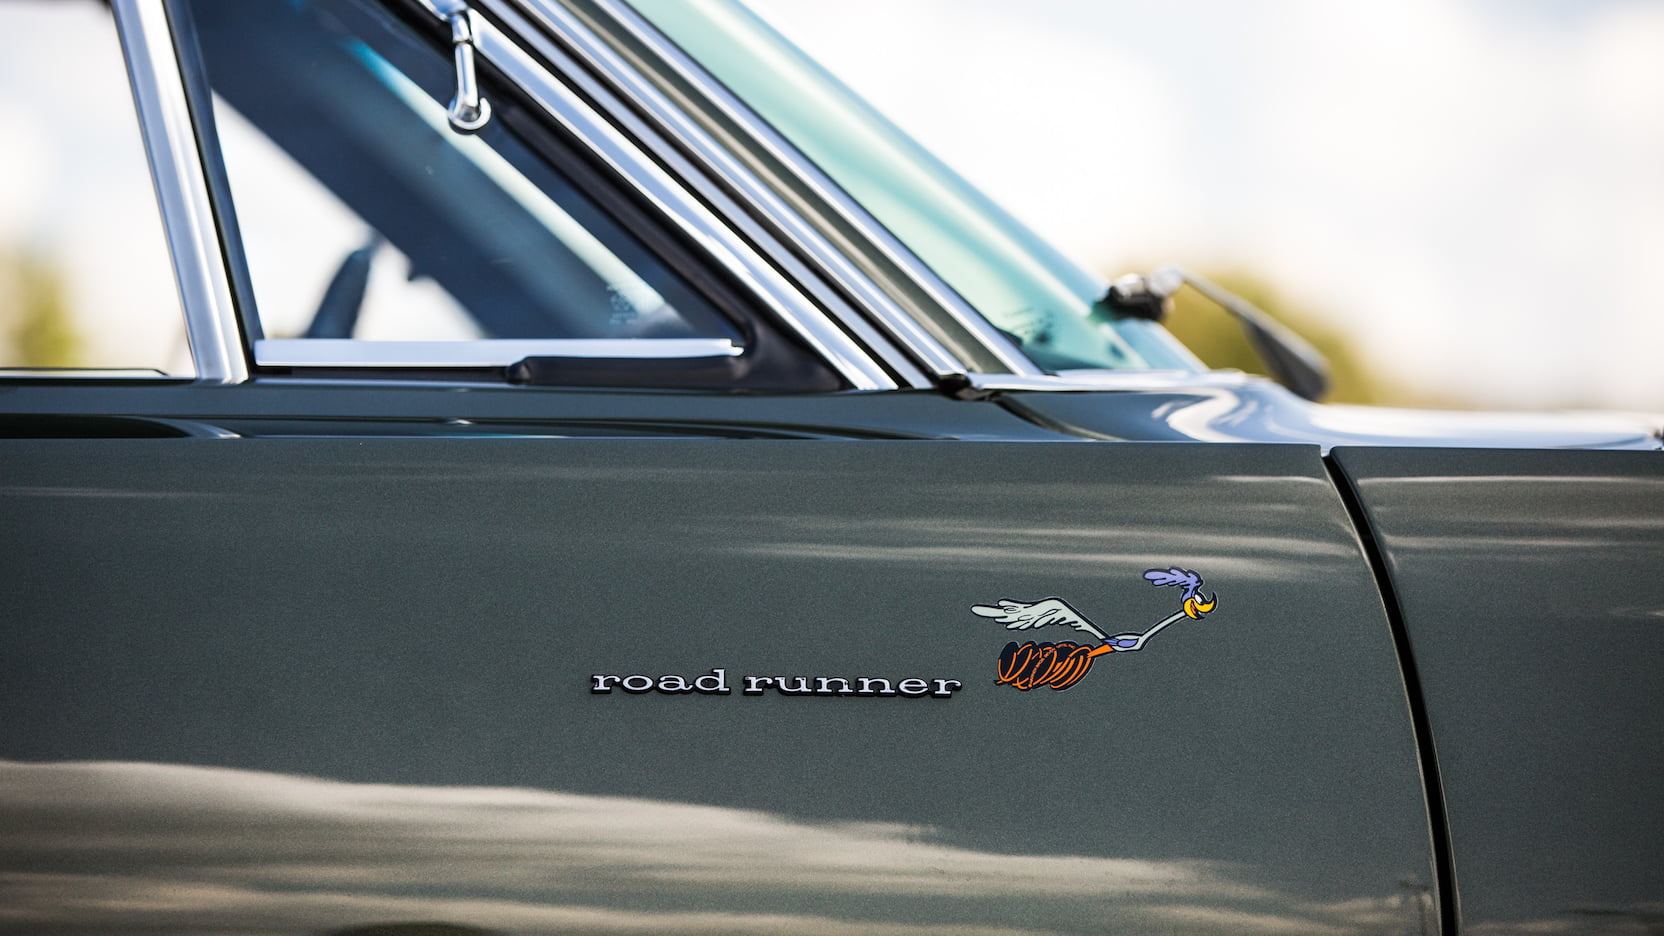 1969 Plymouth Road Runner badge